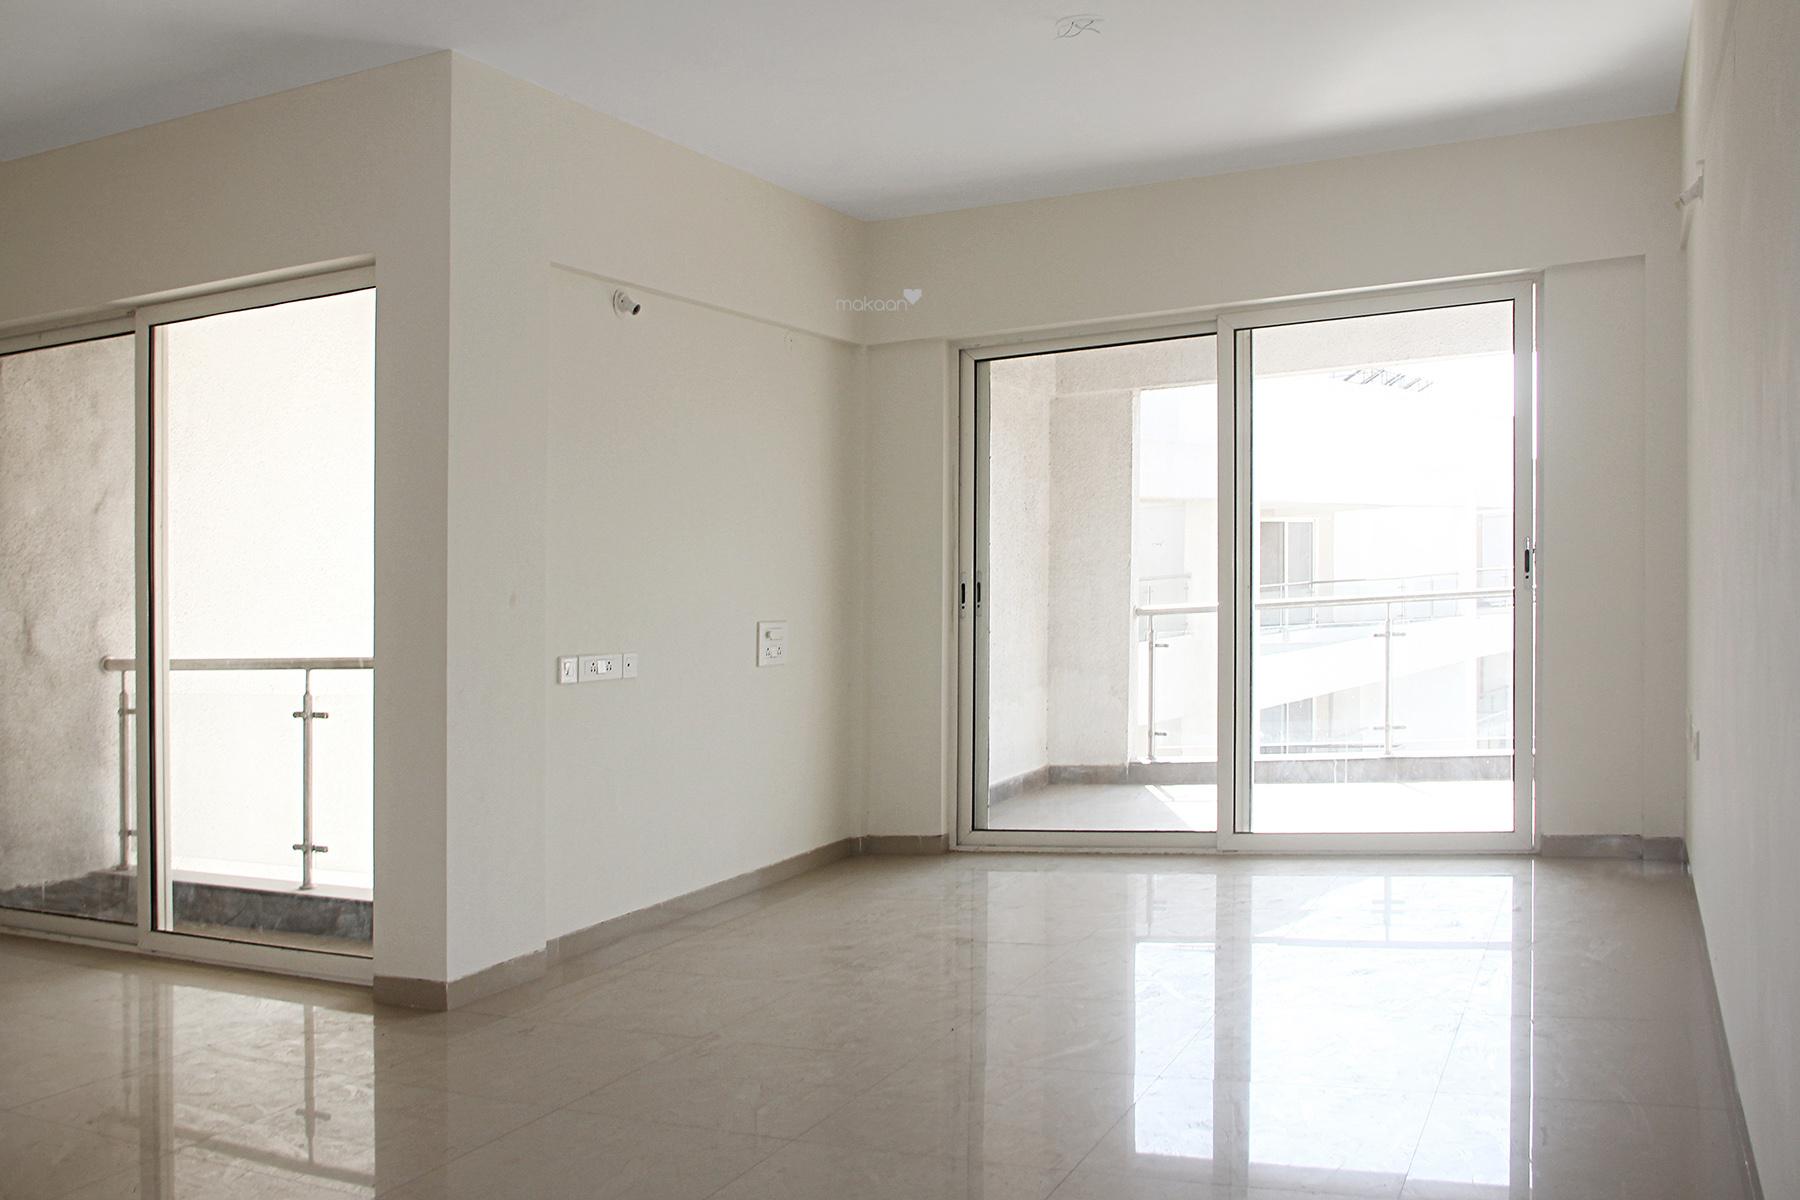 2266 sq ft 3BHK 3BHK+3T (2,266 sq ft) Property By Proptiger In Precioso, Kharadi